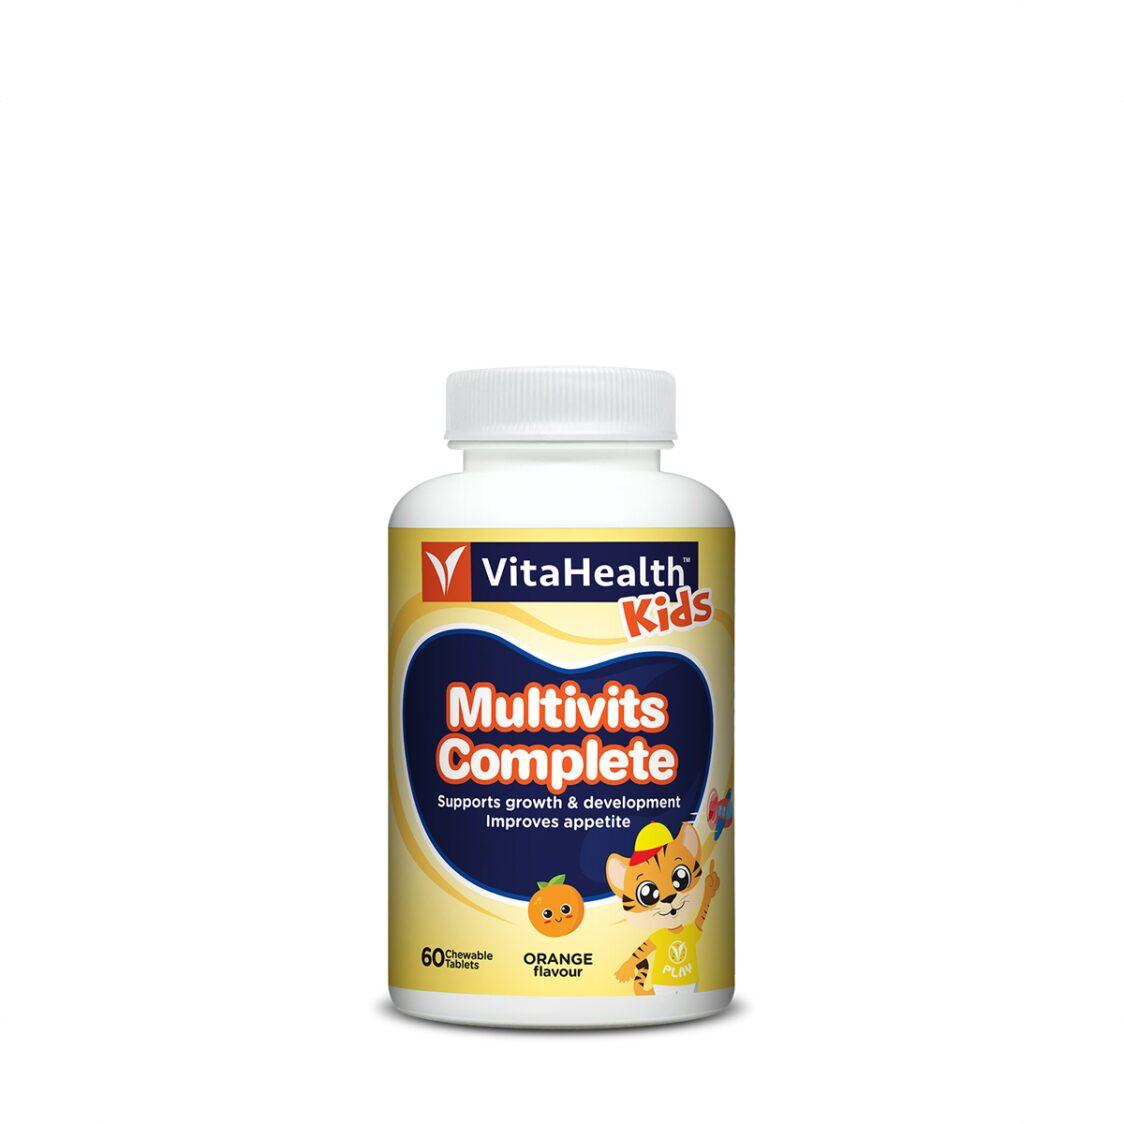 VitaHealth Kids Multivits Complete 60 Chewable Tablets